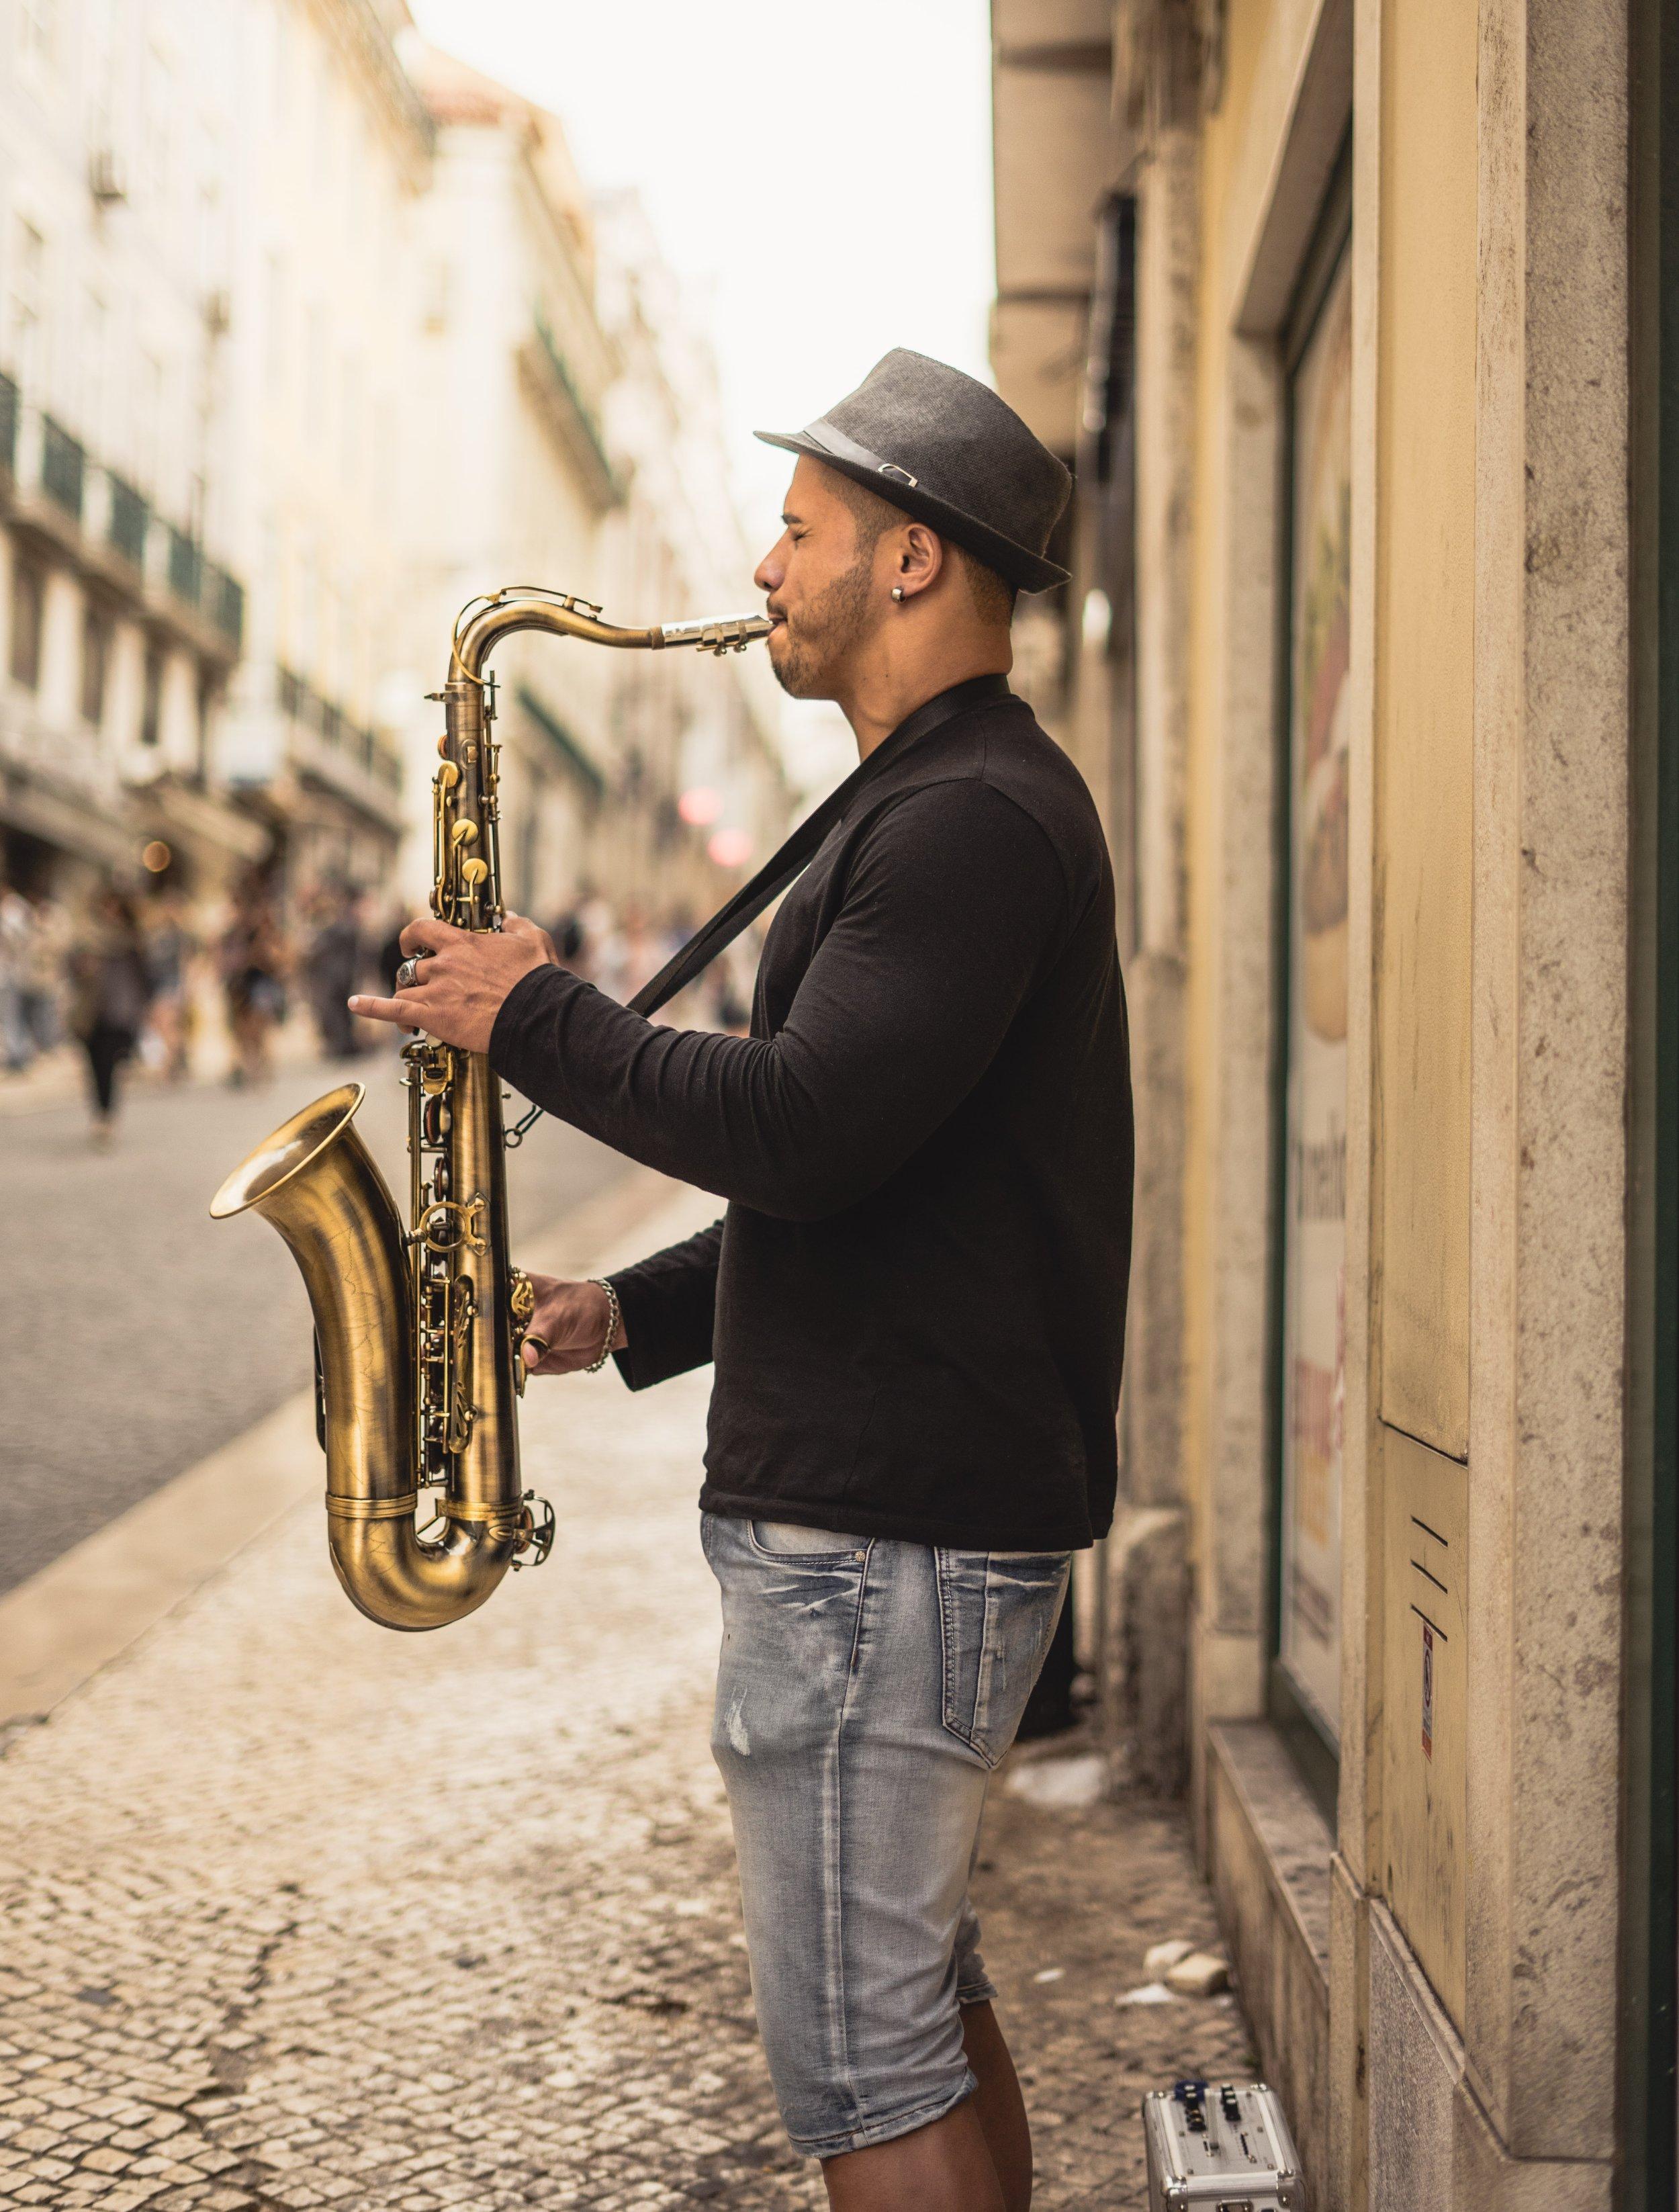 sax player in Lisbon Portugal.jpg